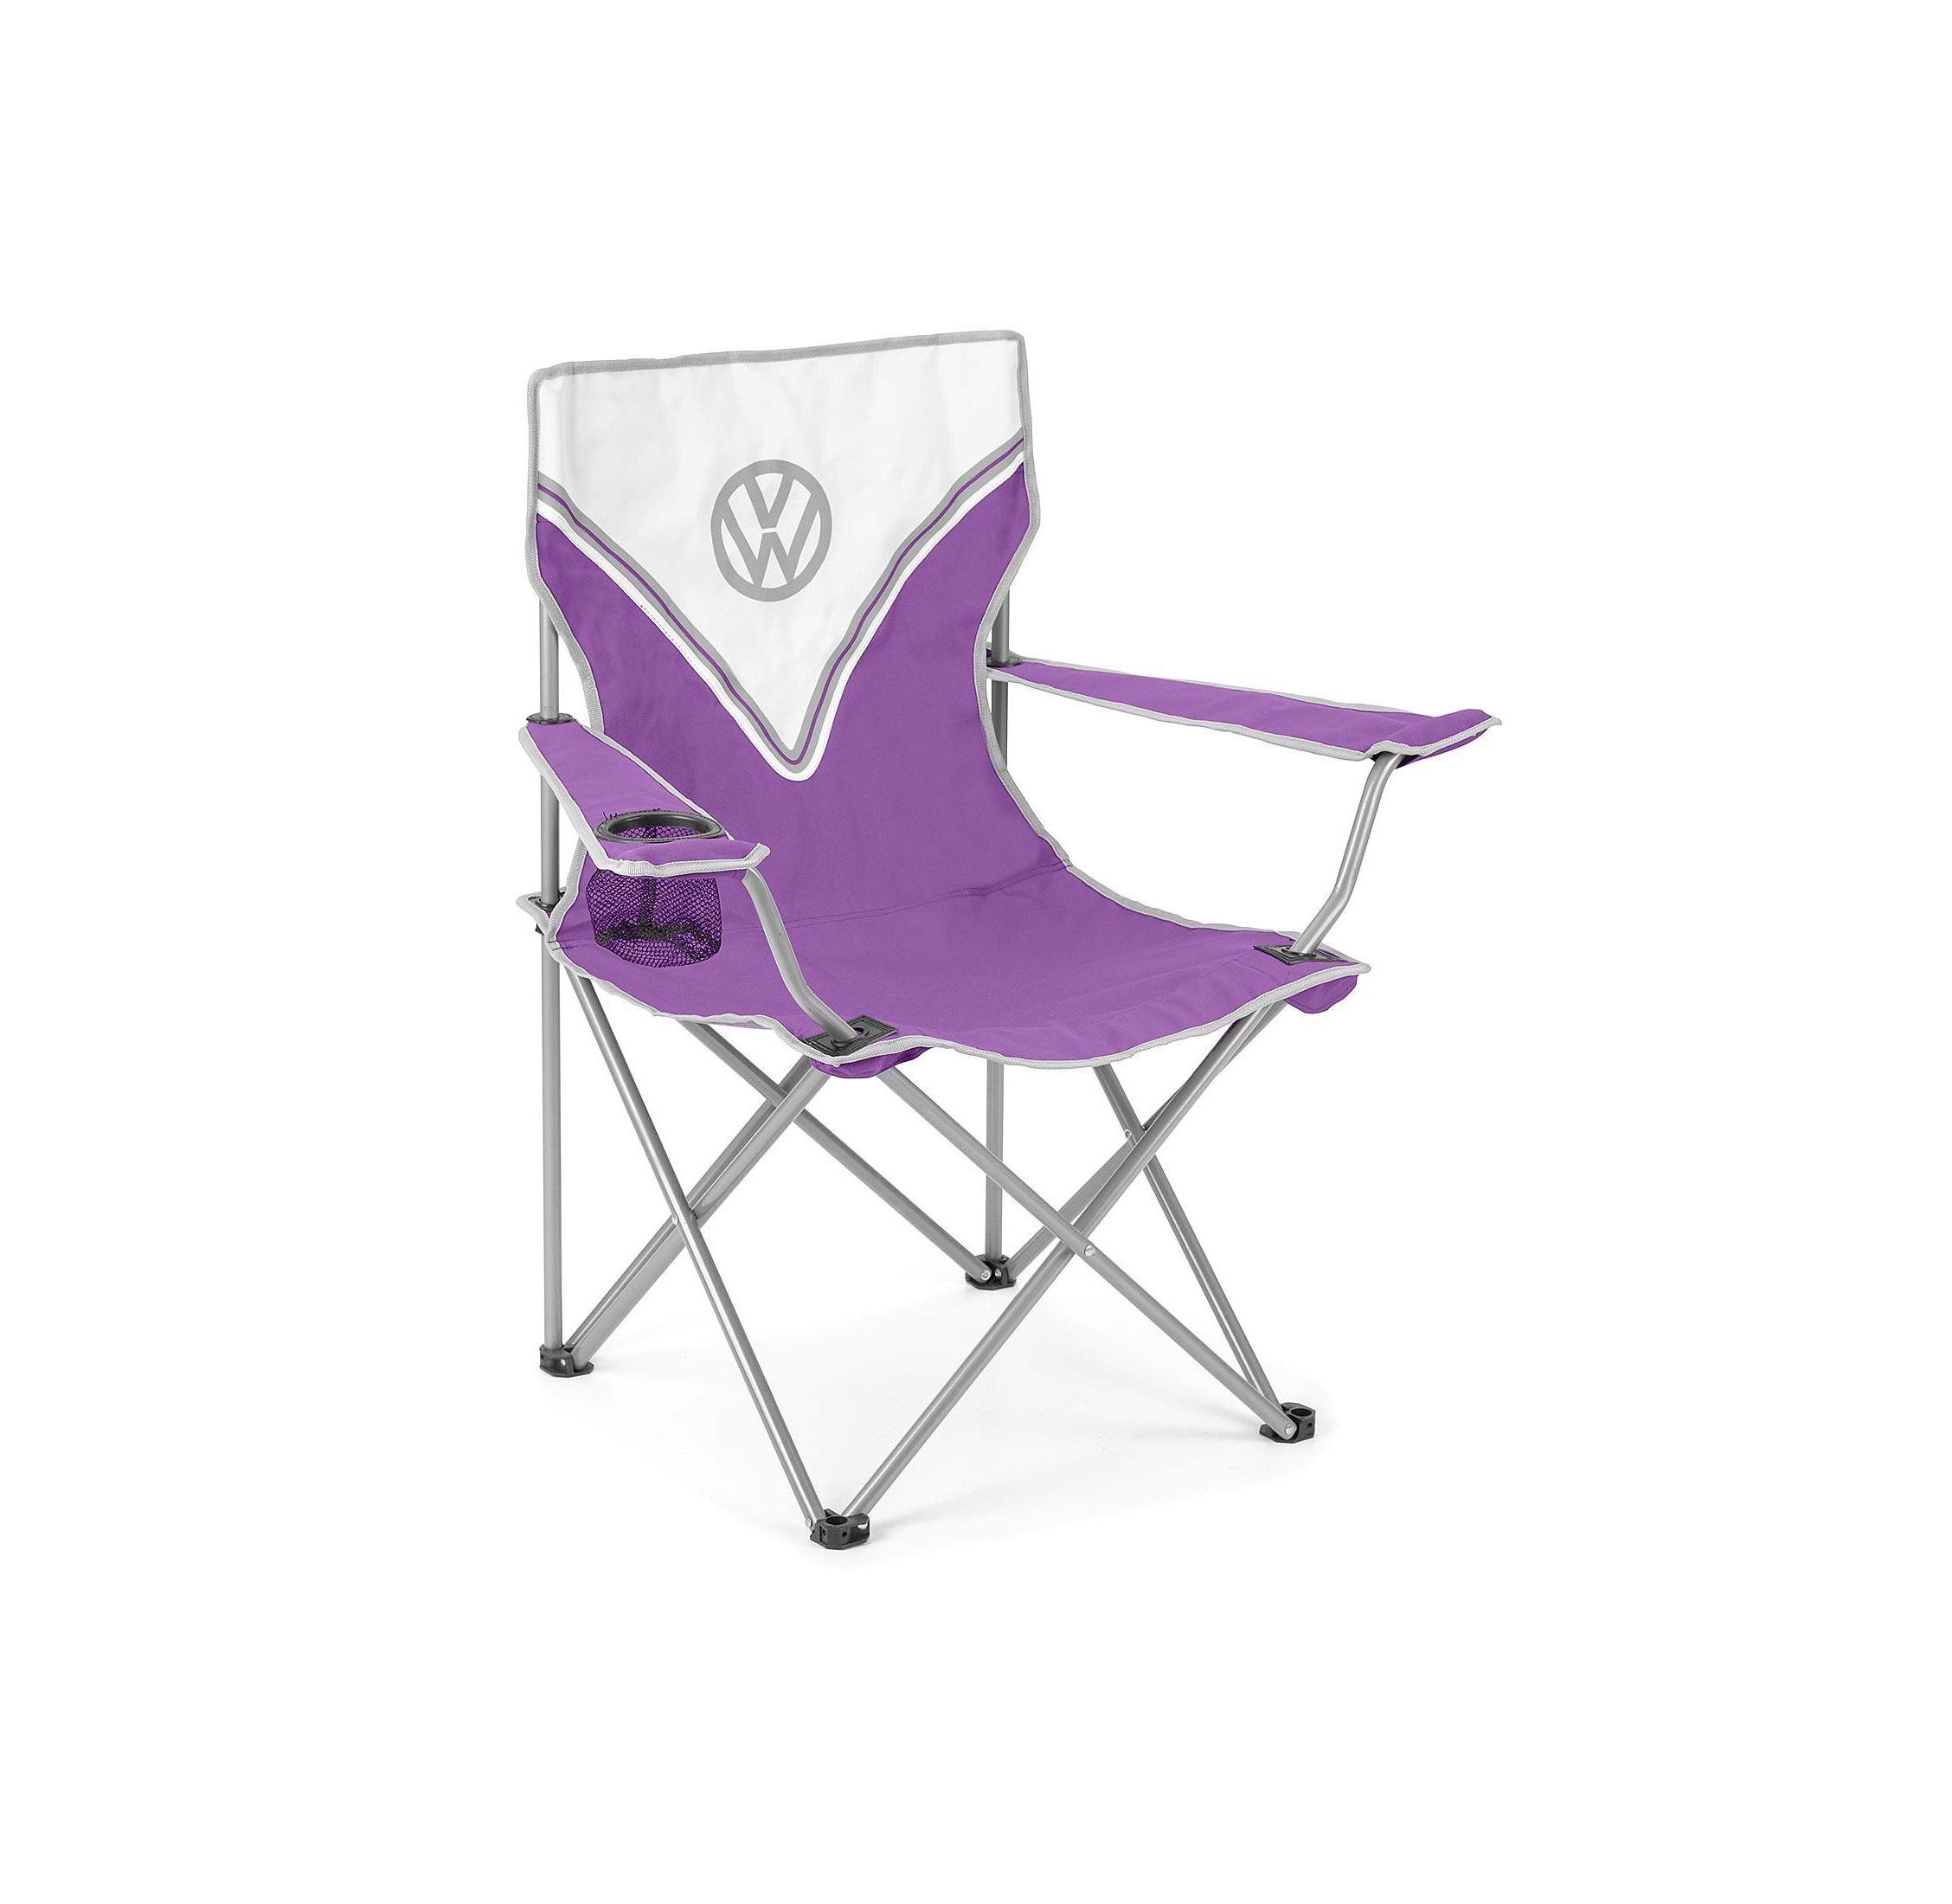 Vw Camping Chair Purple 2